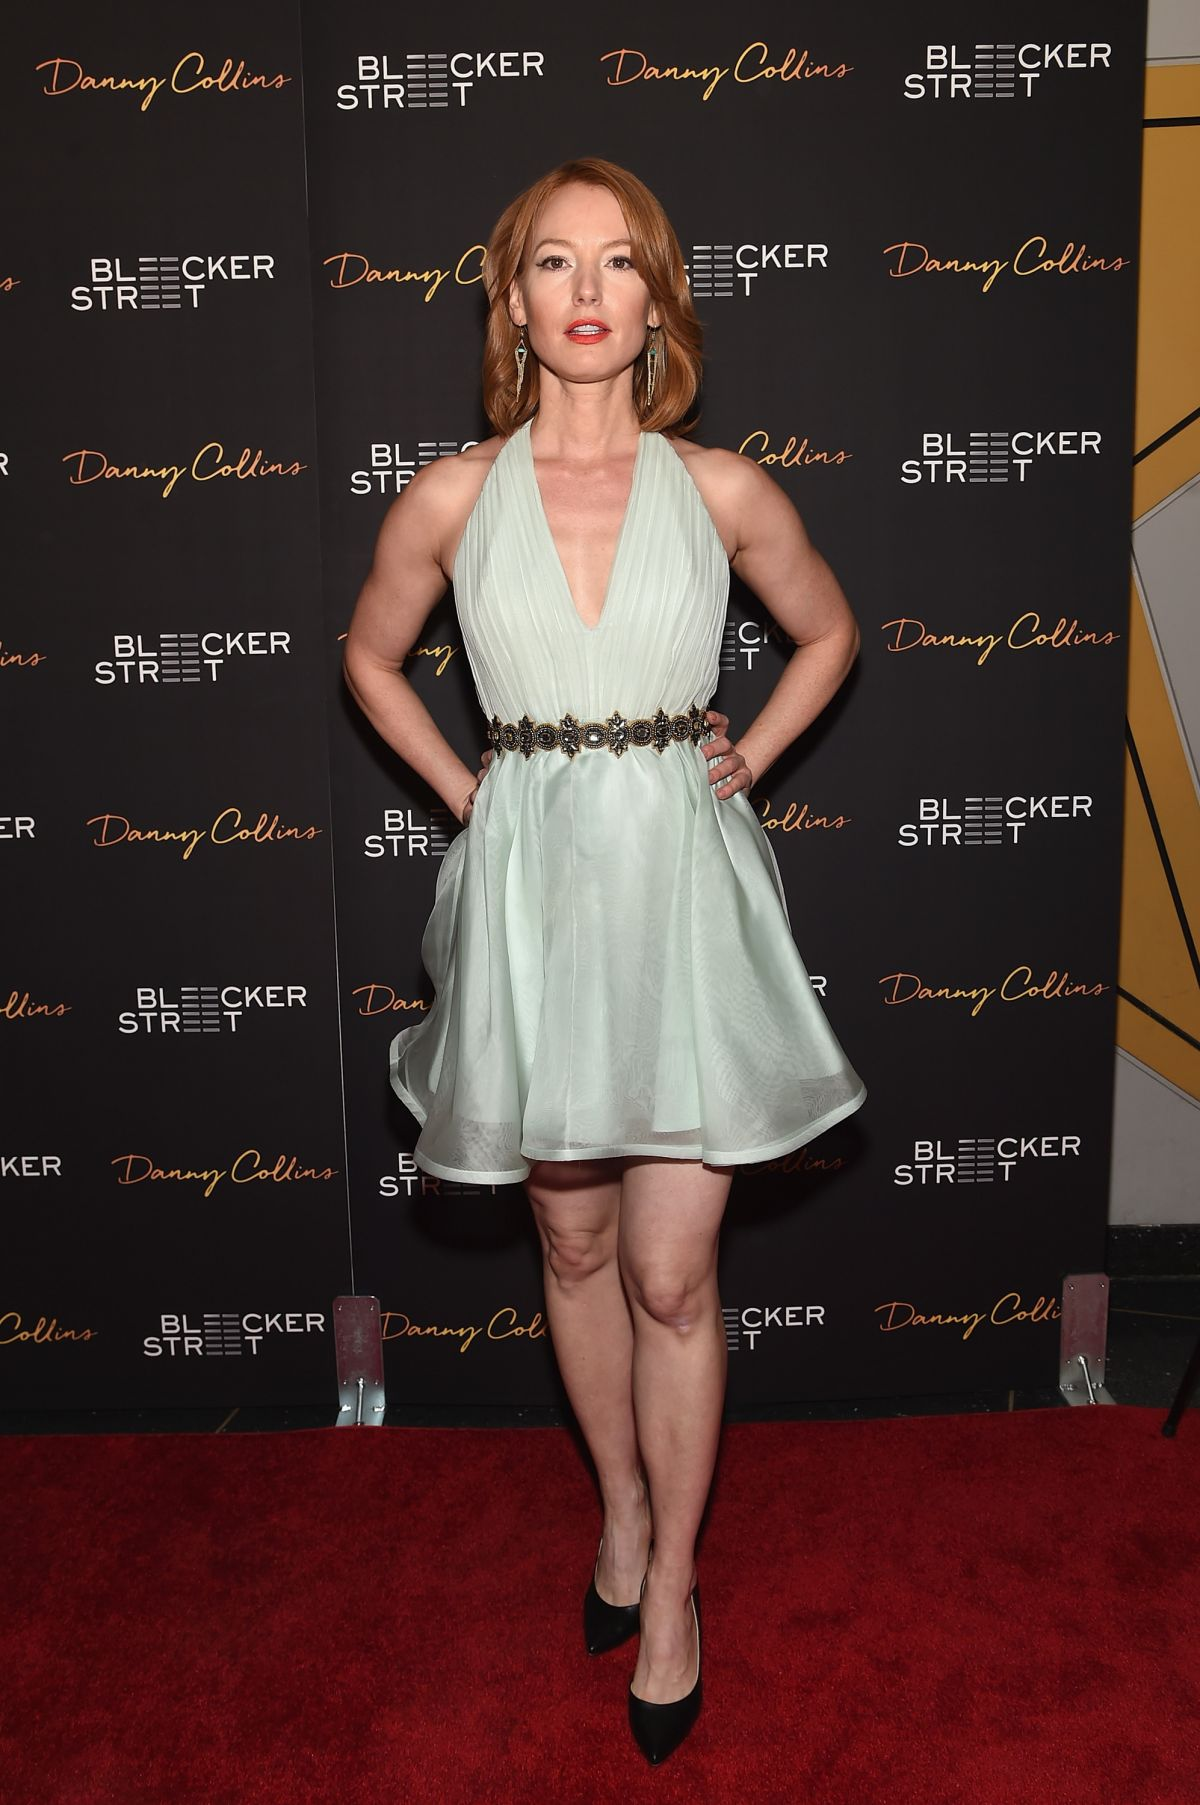 ALICIA WITT at Danny Collins Premiere in New York